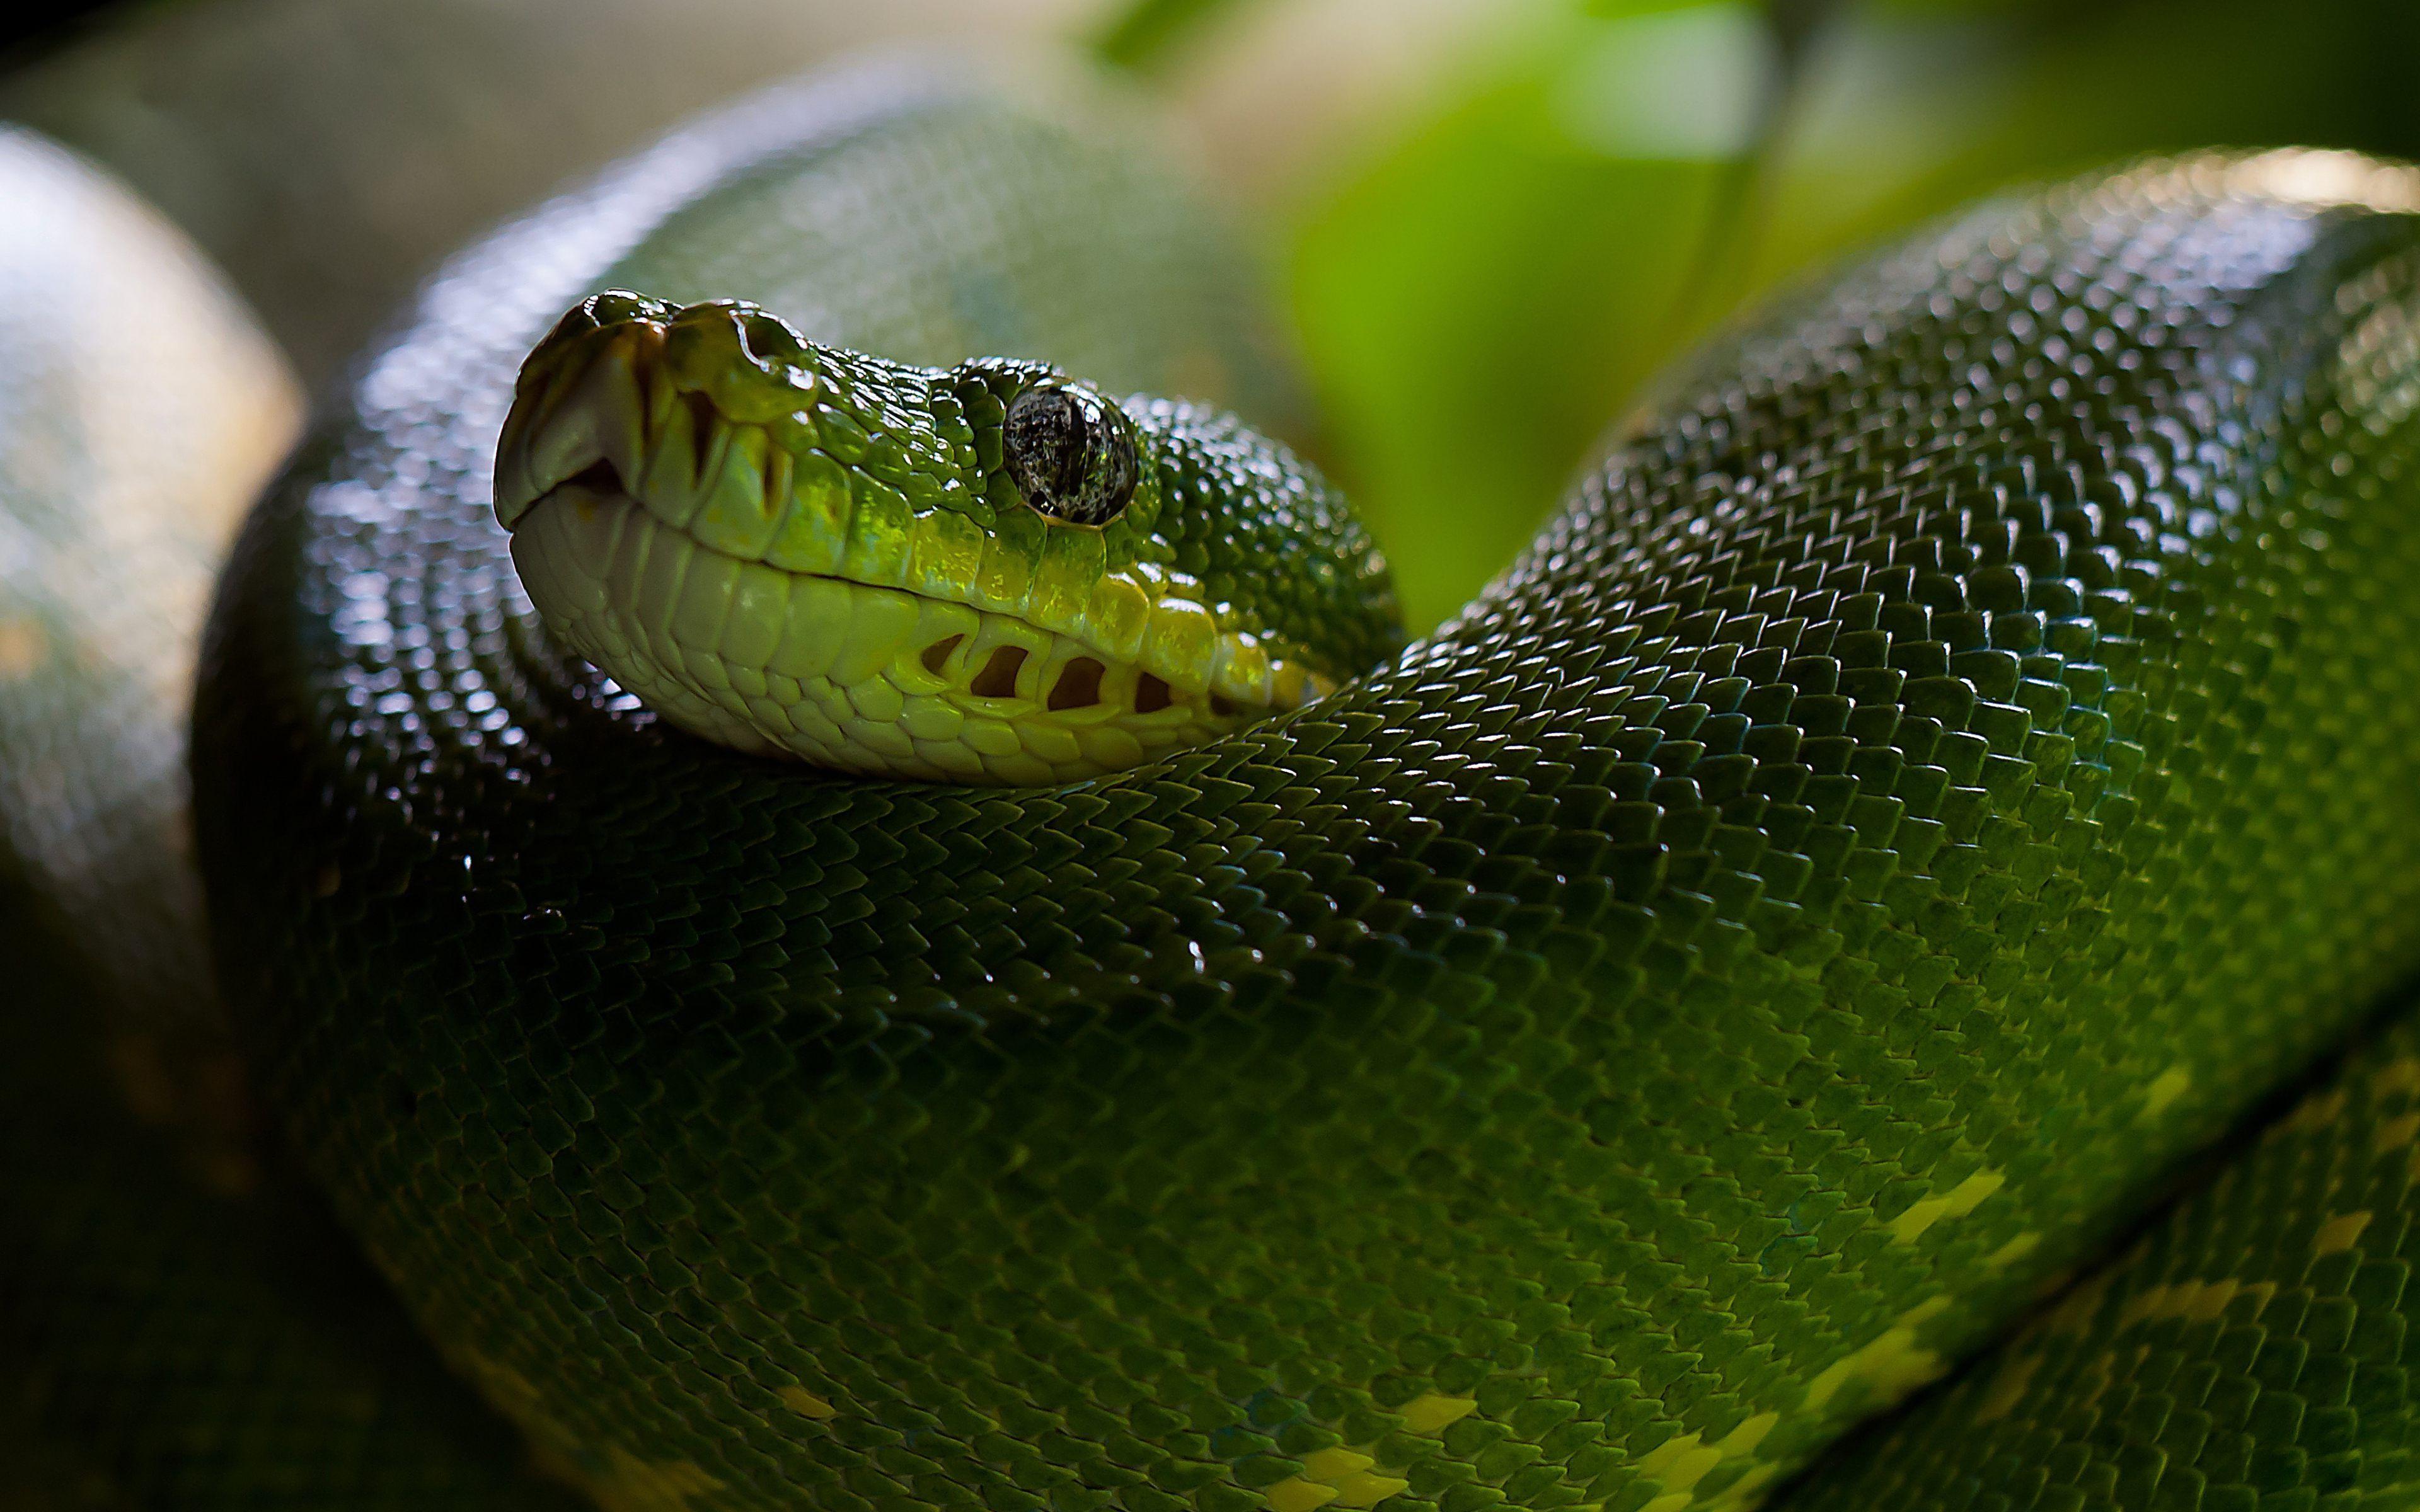 green snake wallpaper with high resolution wallpaper 3840x2400 px